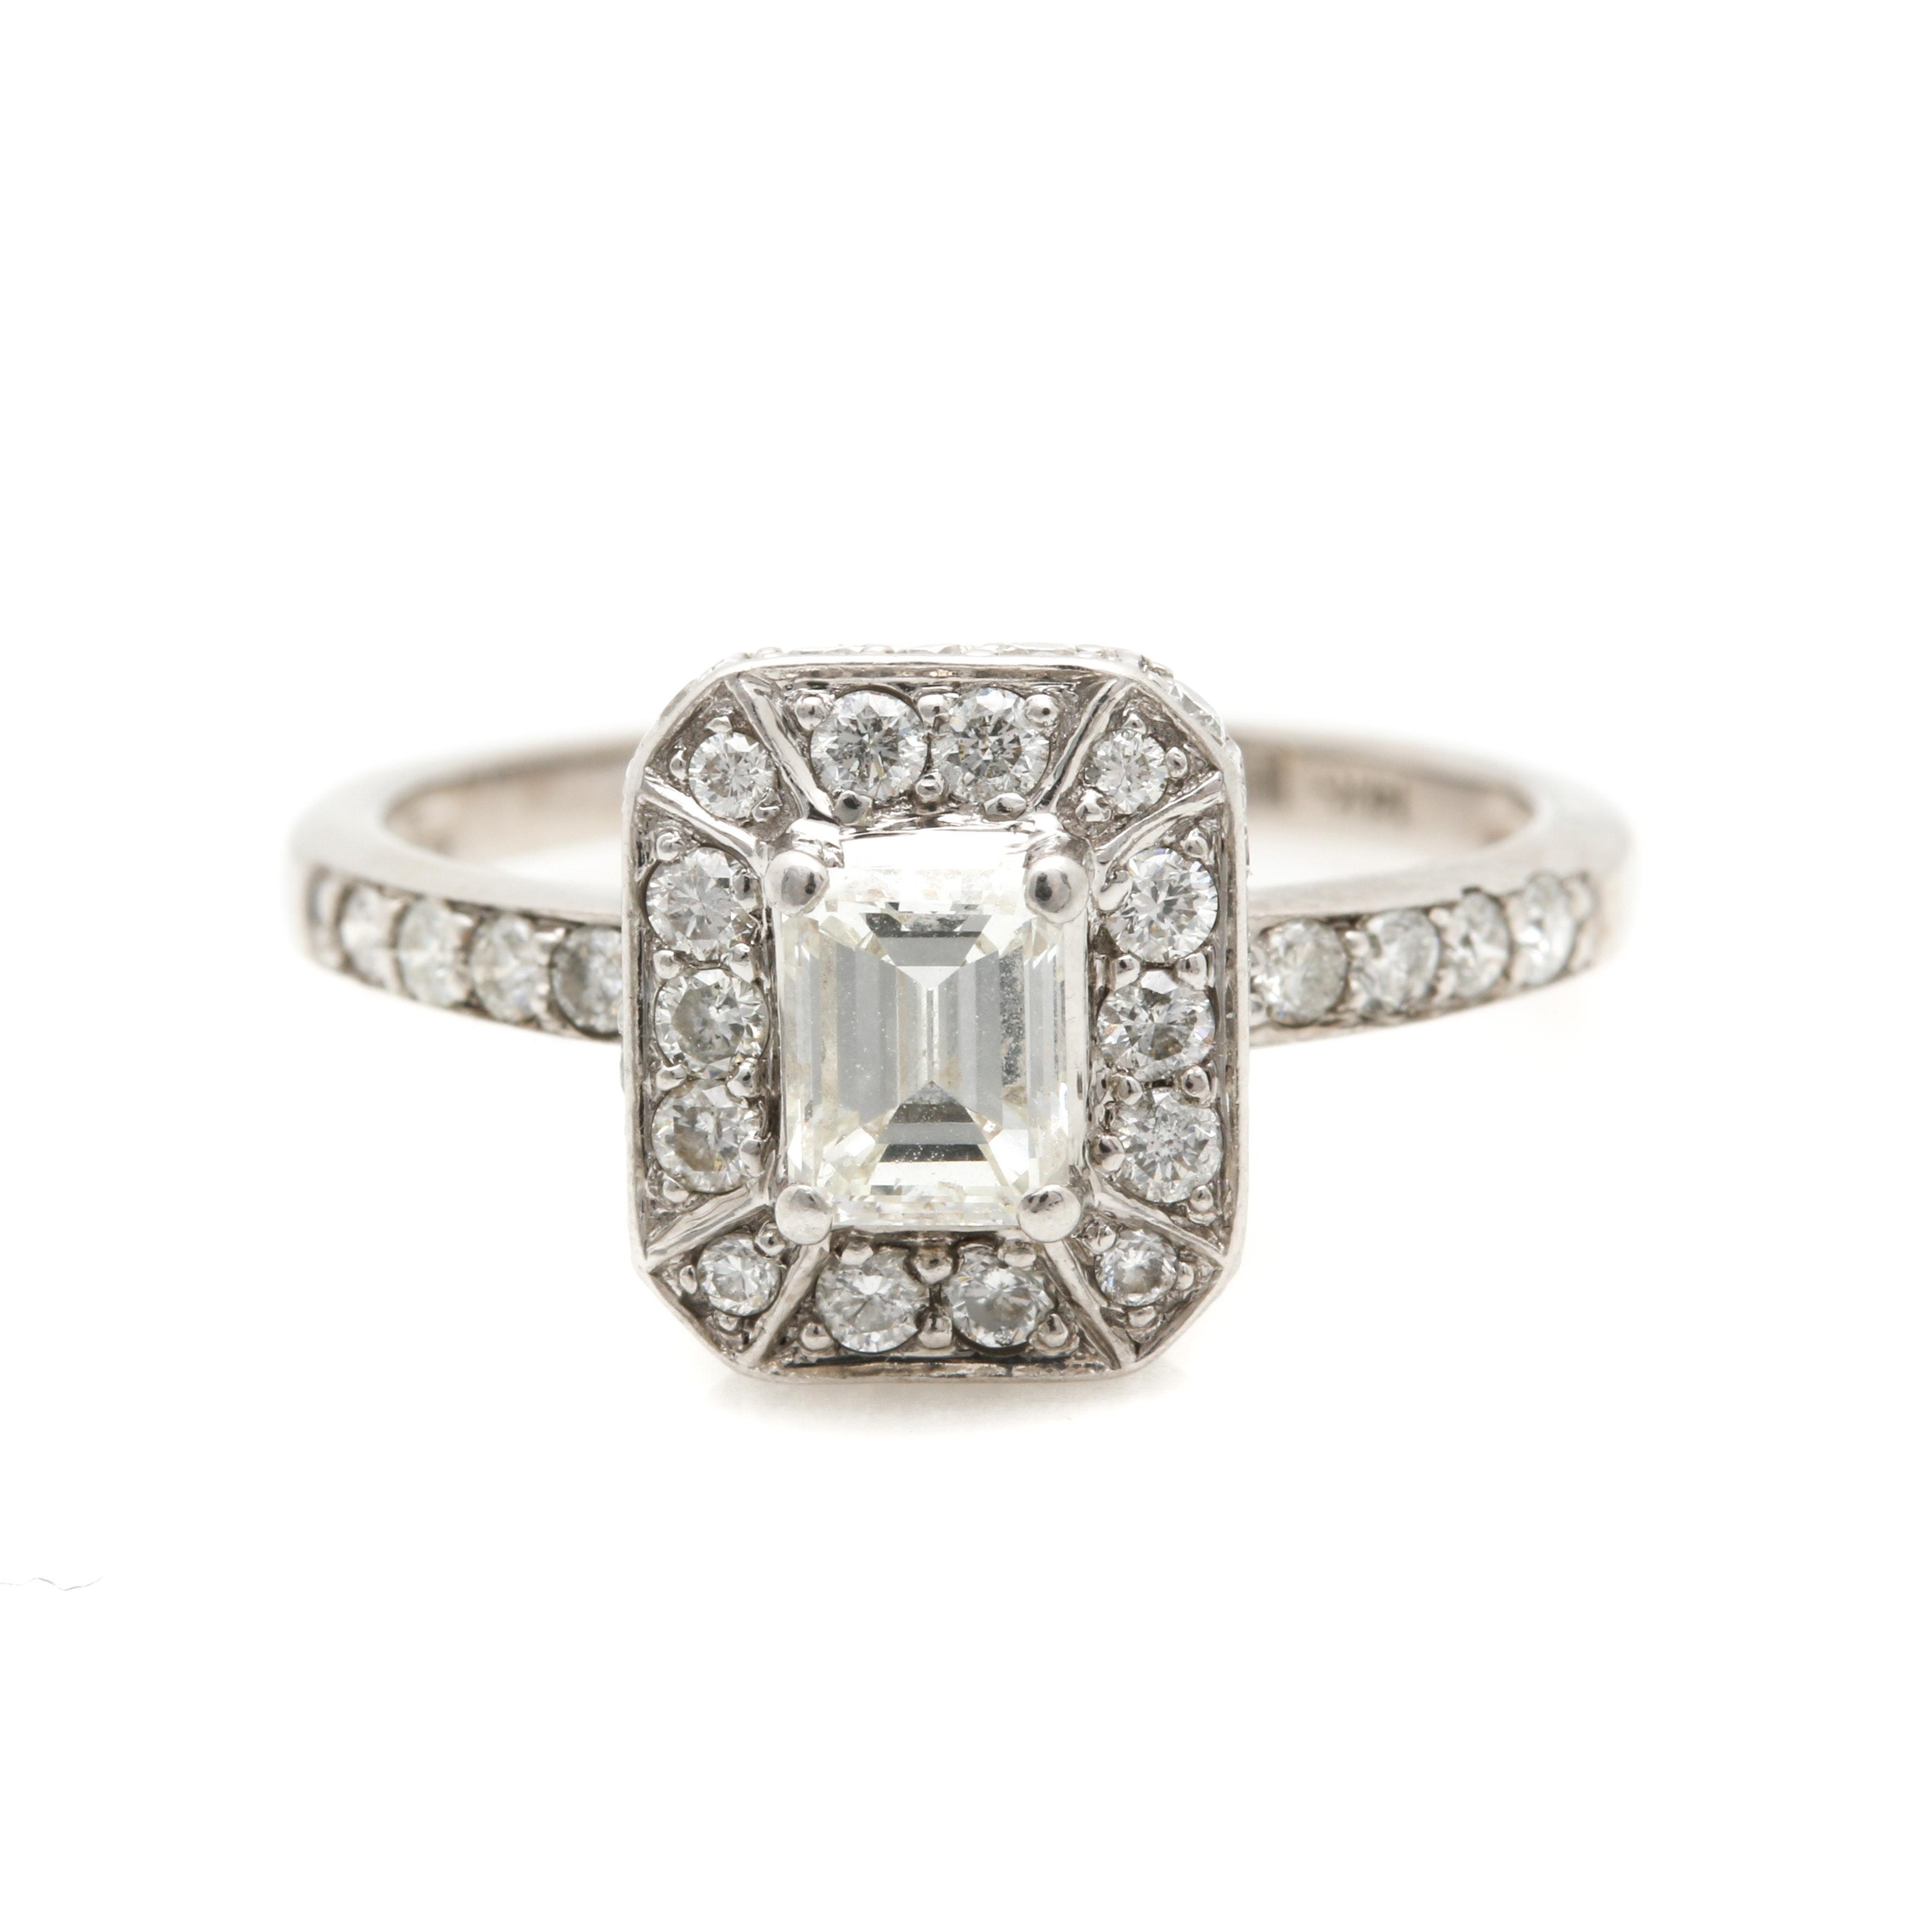 14K White Gold 0.98 CTW Diamond Ring